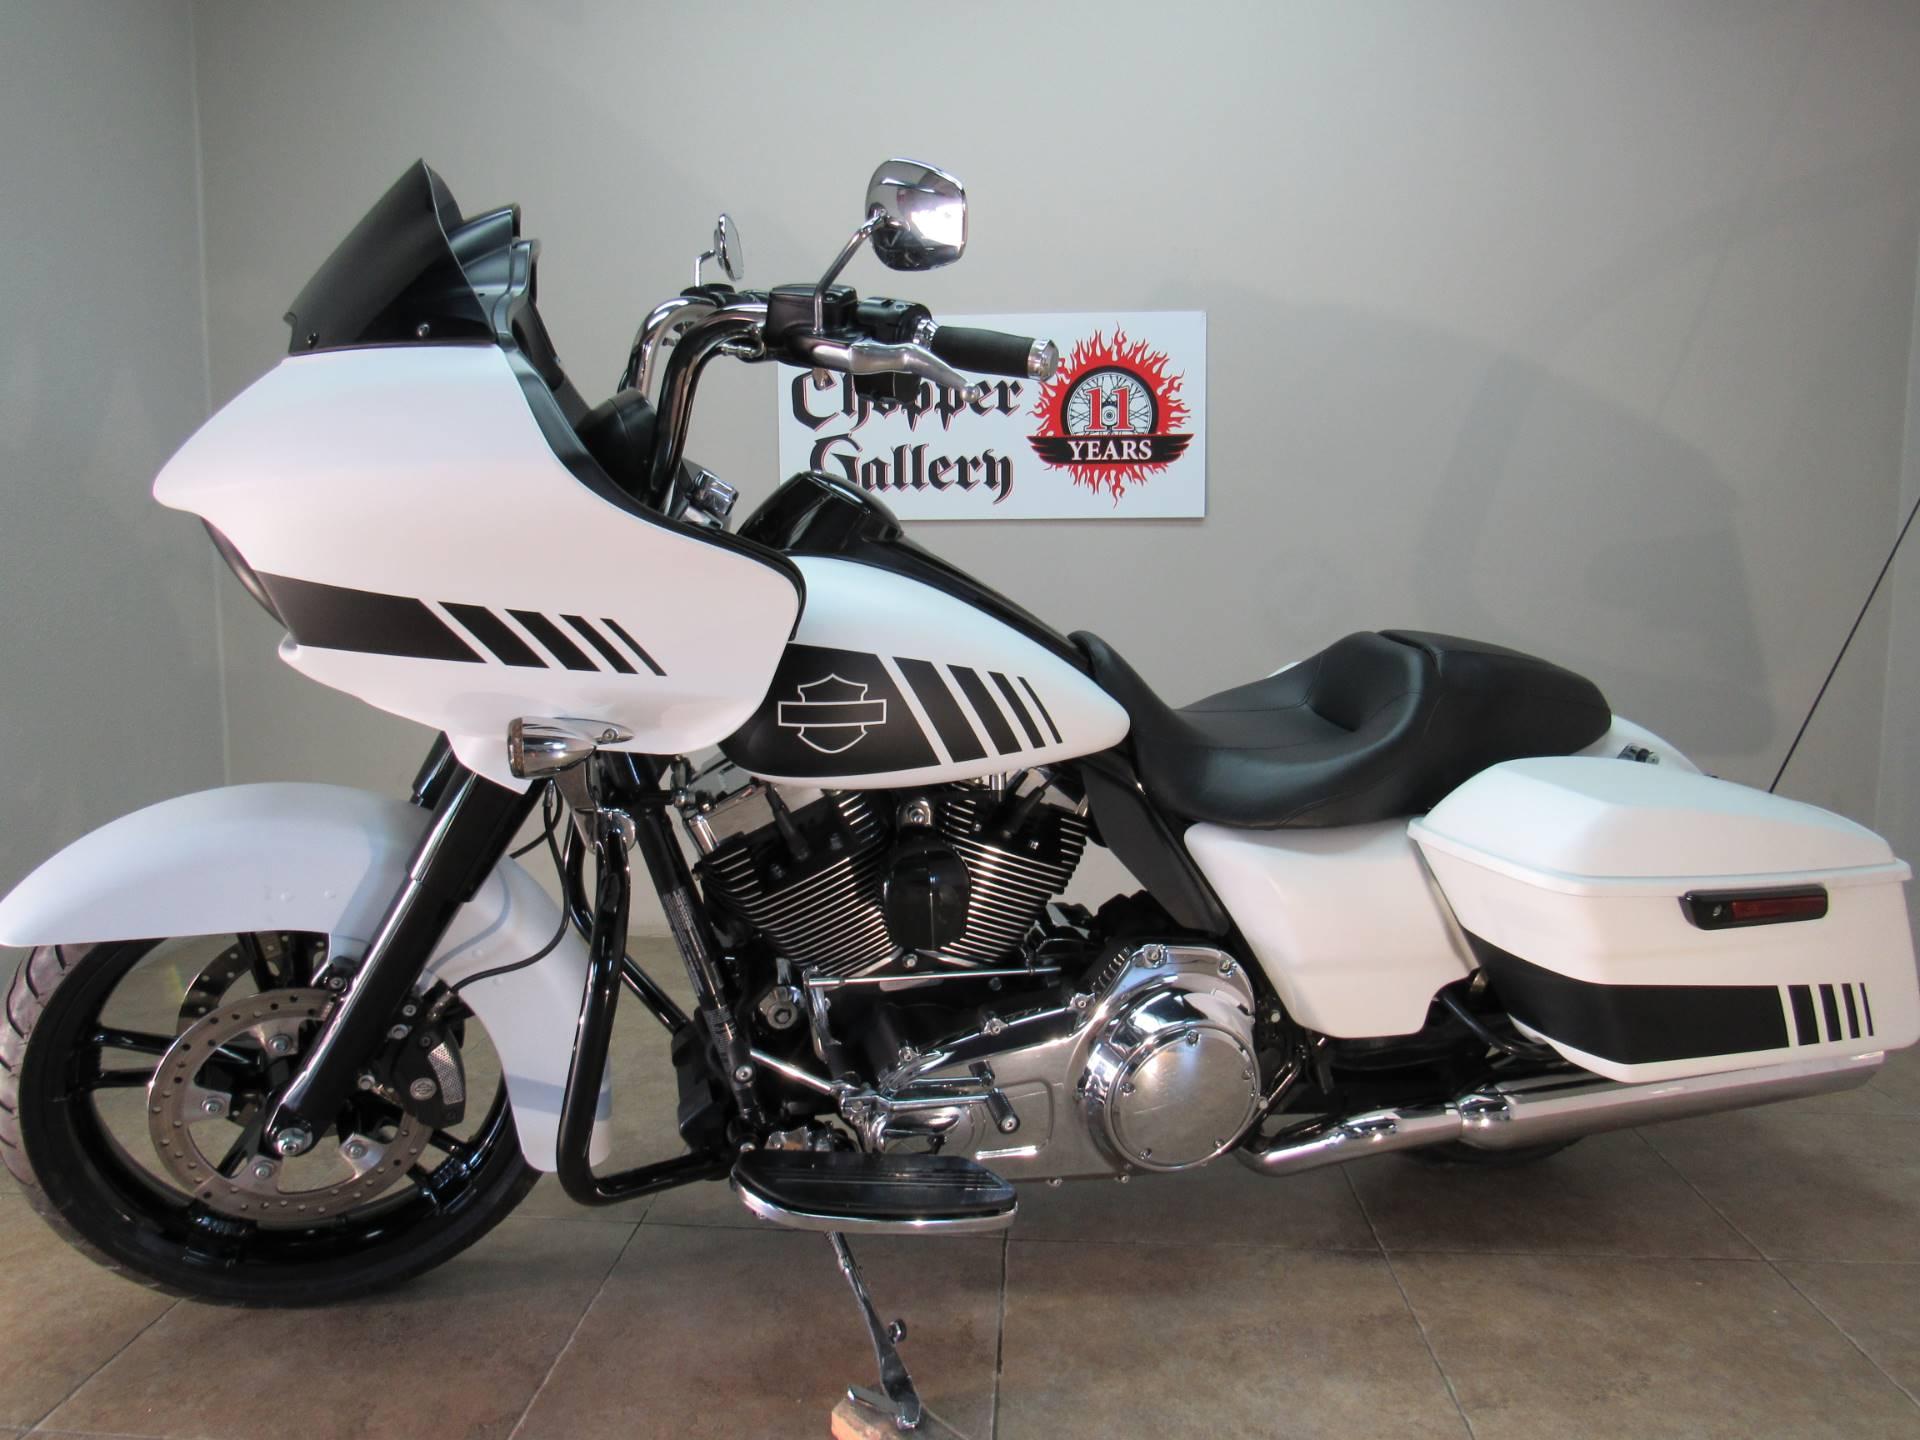 Used motorcycles, custom bobbers, trikes, bikes,cycles